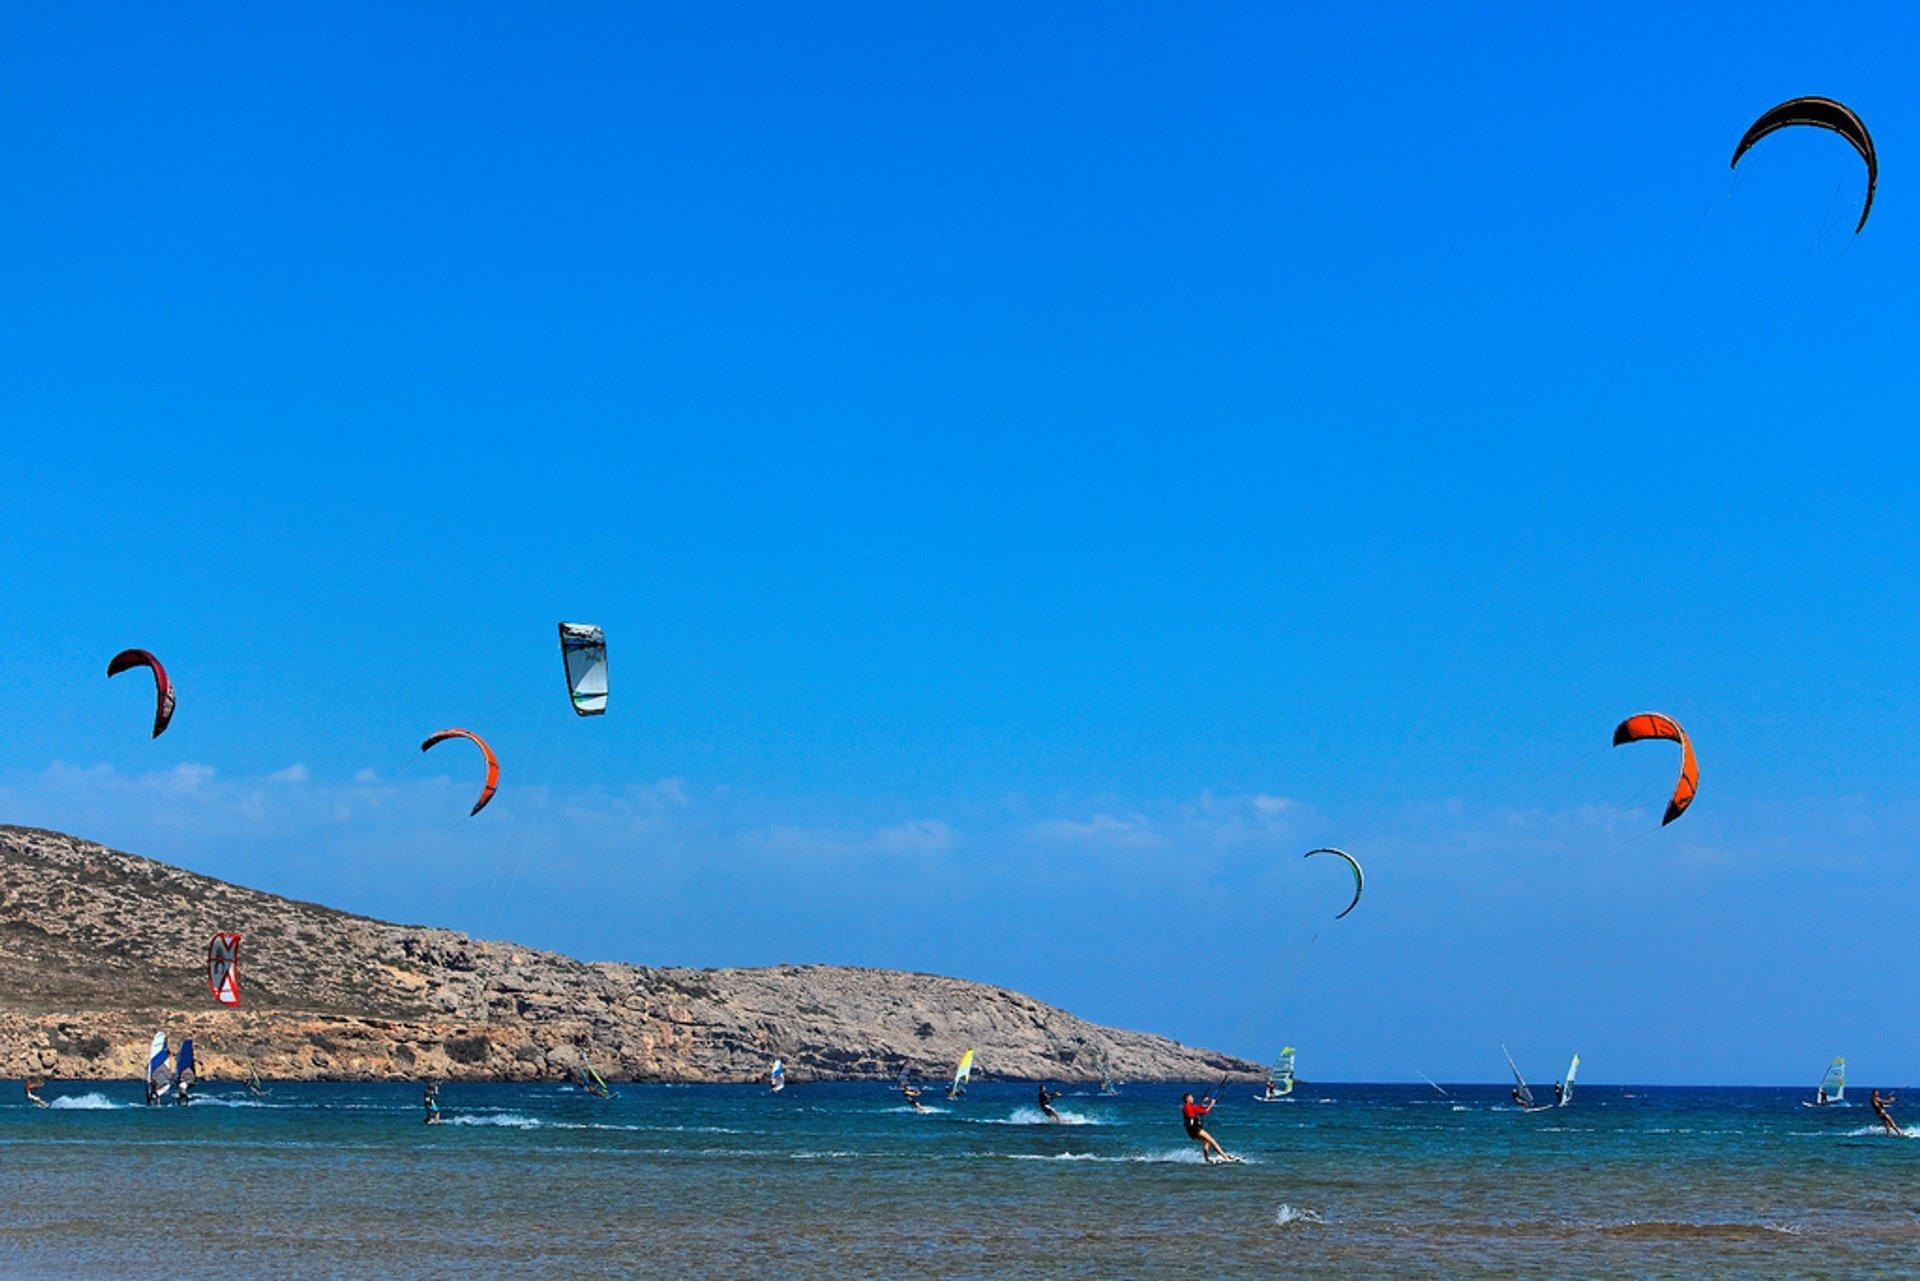 Kitesurfing by Prasonisi Cape, Rodos Island 2020